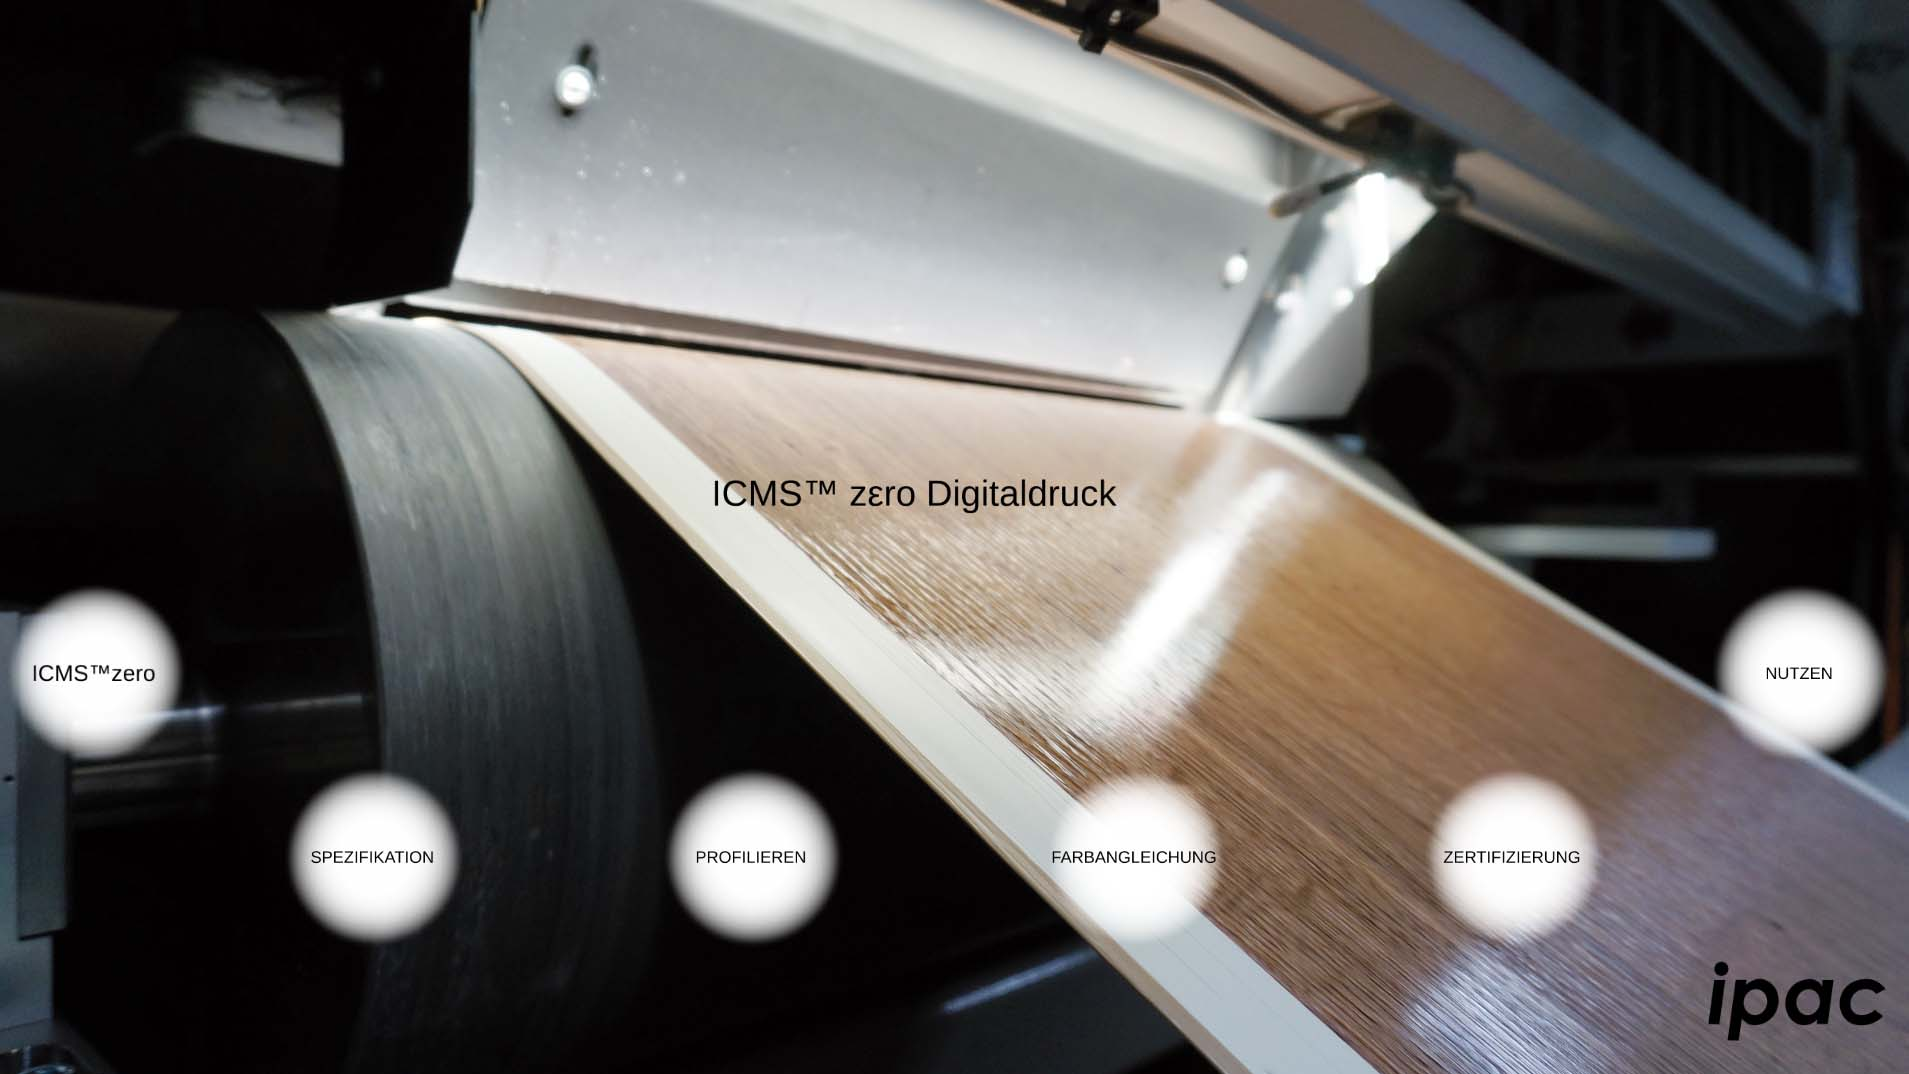 ICMS zero Digitaldruck